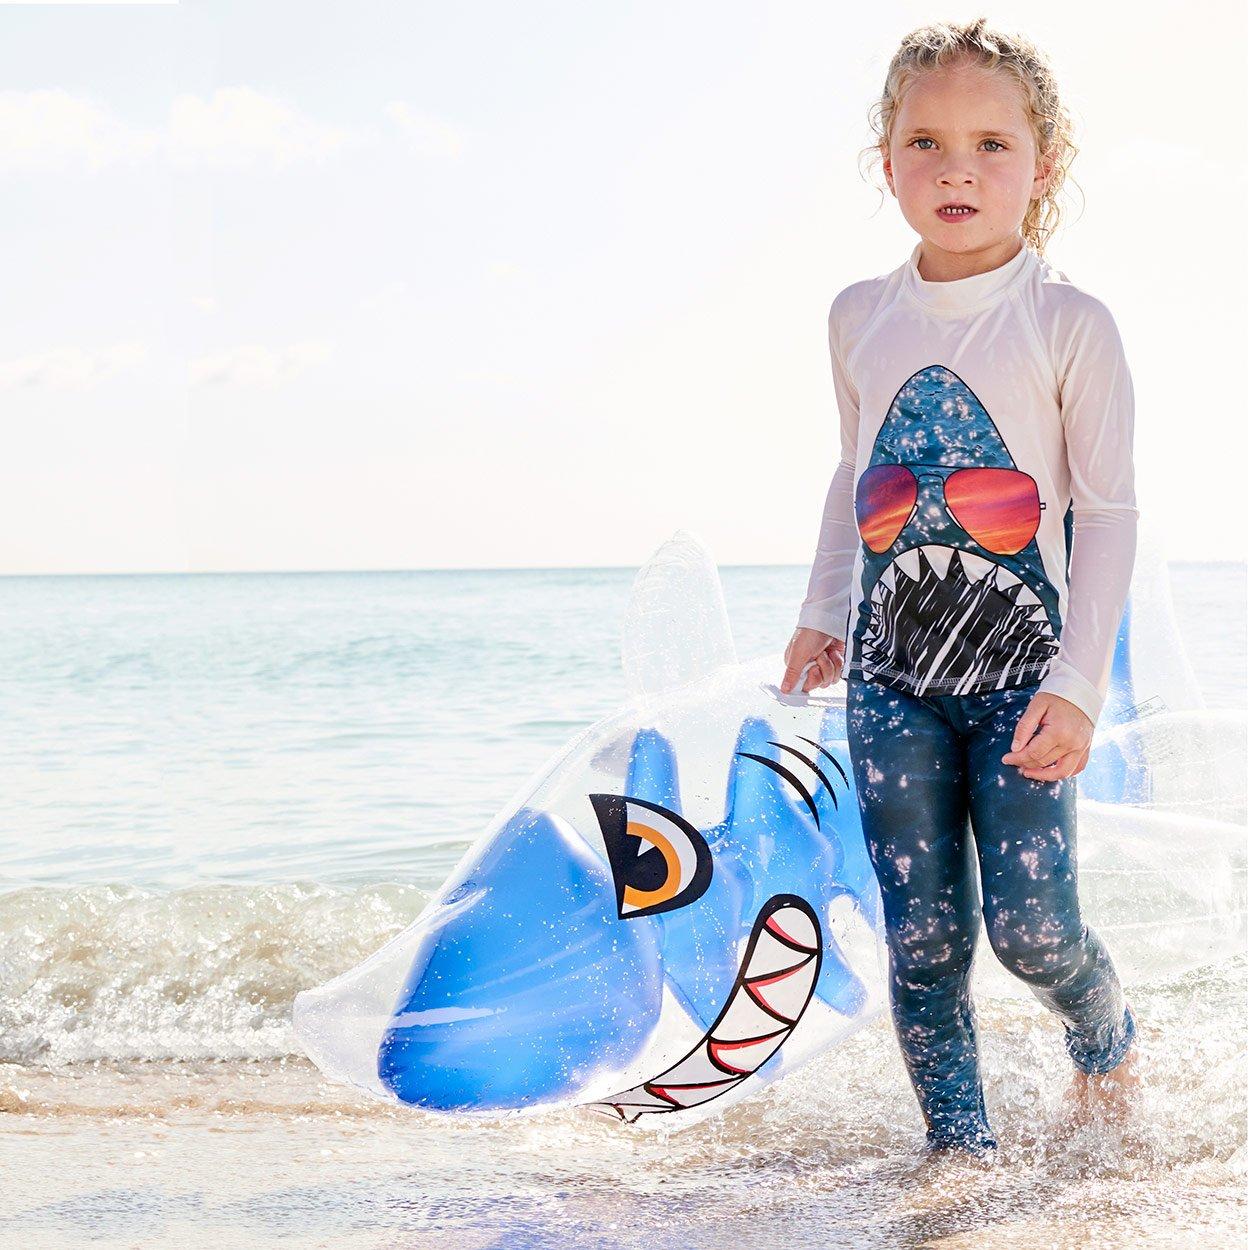 Shark 2Pc Rash Guard Set Girls With Inflatable Shark On The Beach Sunpoplife